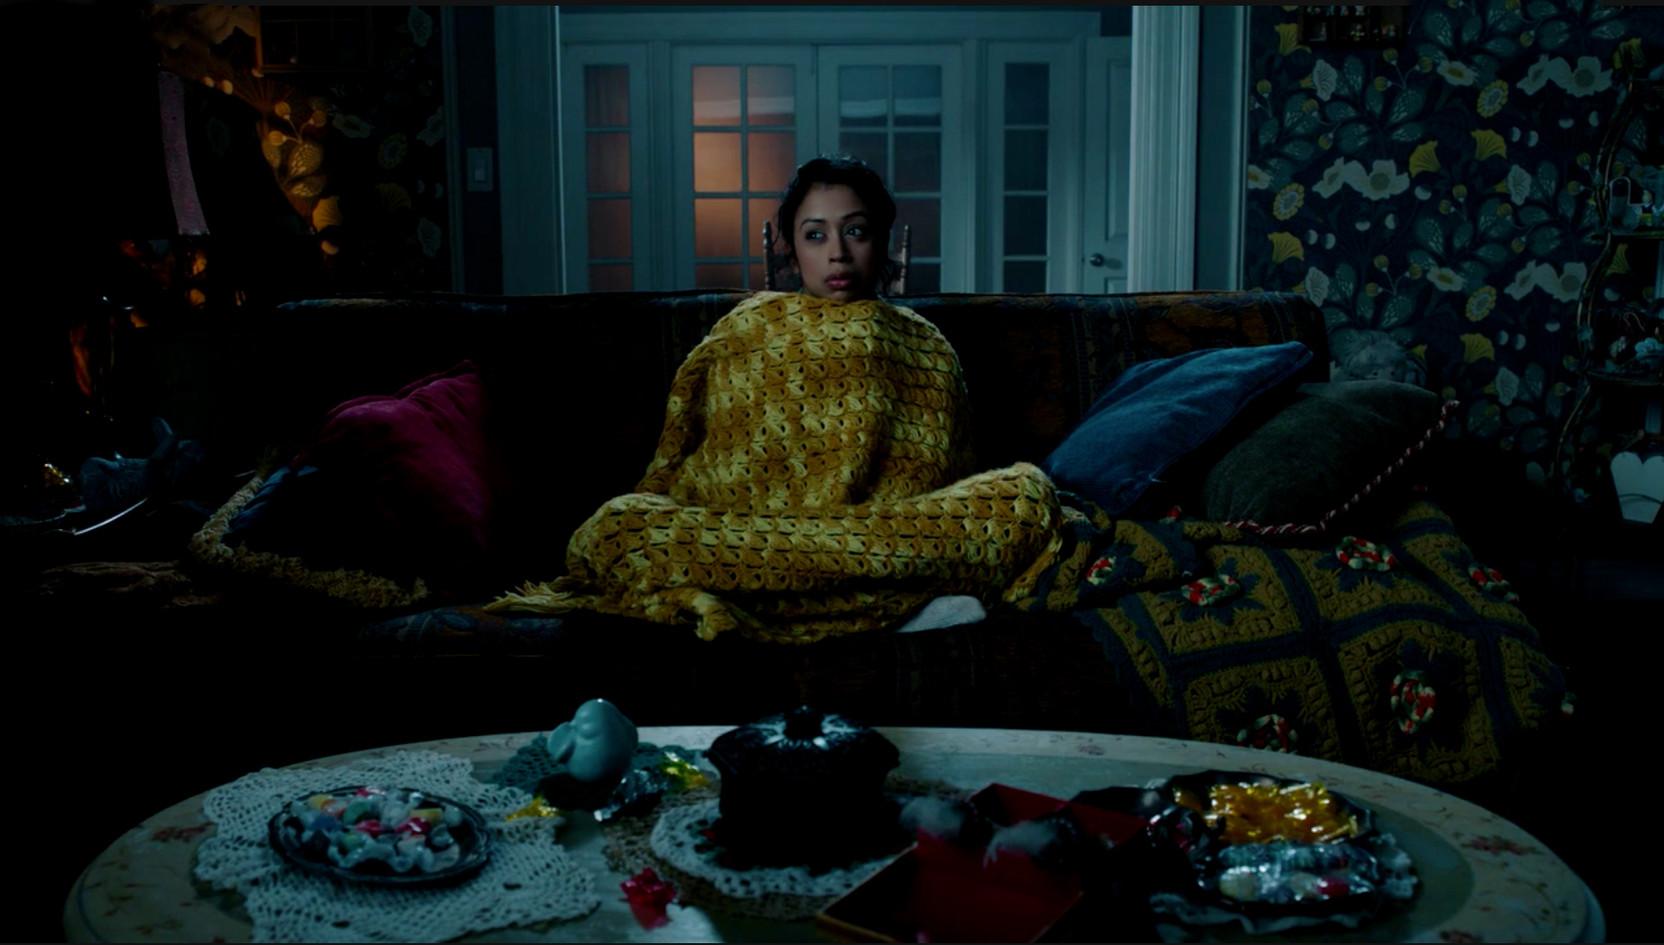 Film Still - Claudine's Apt.